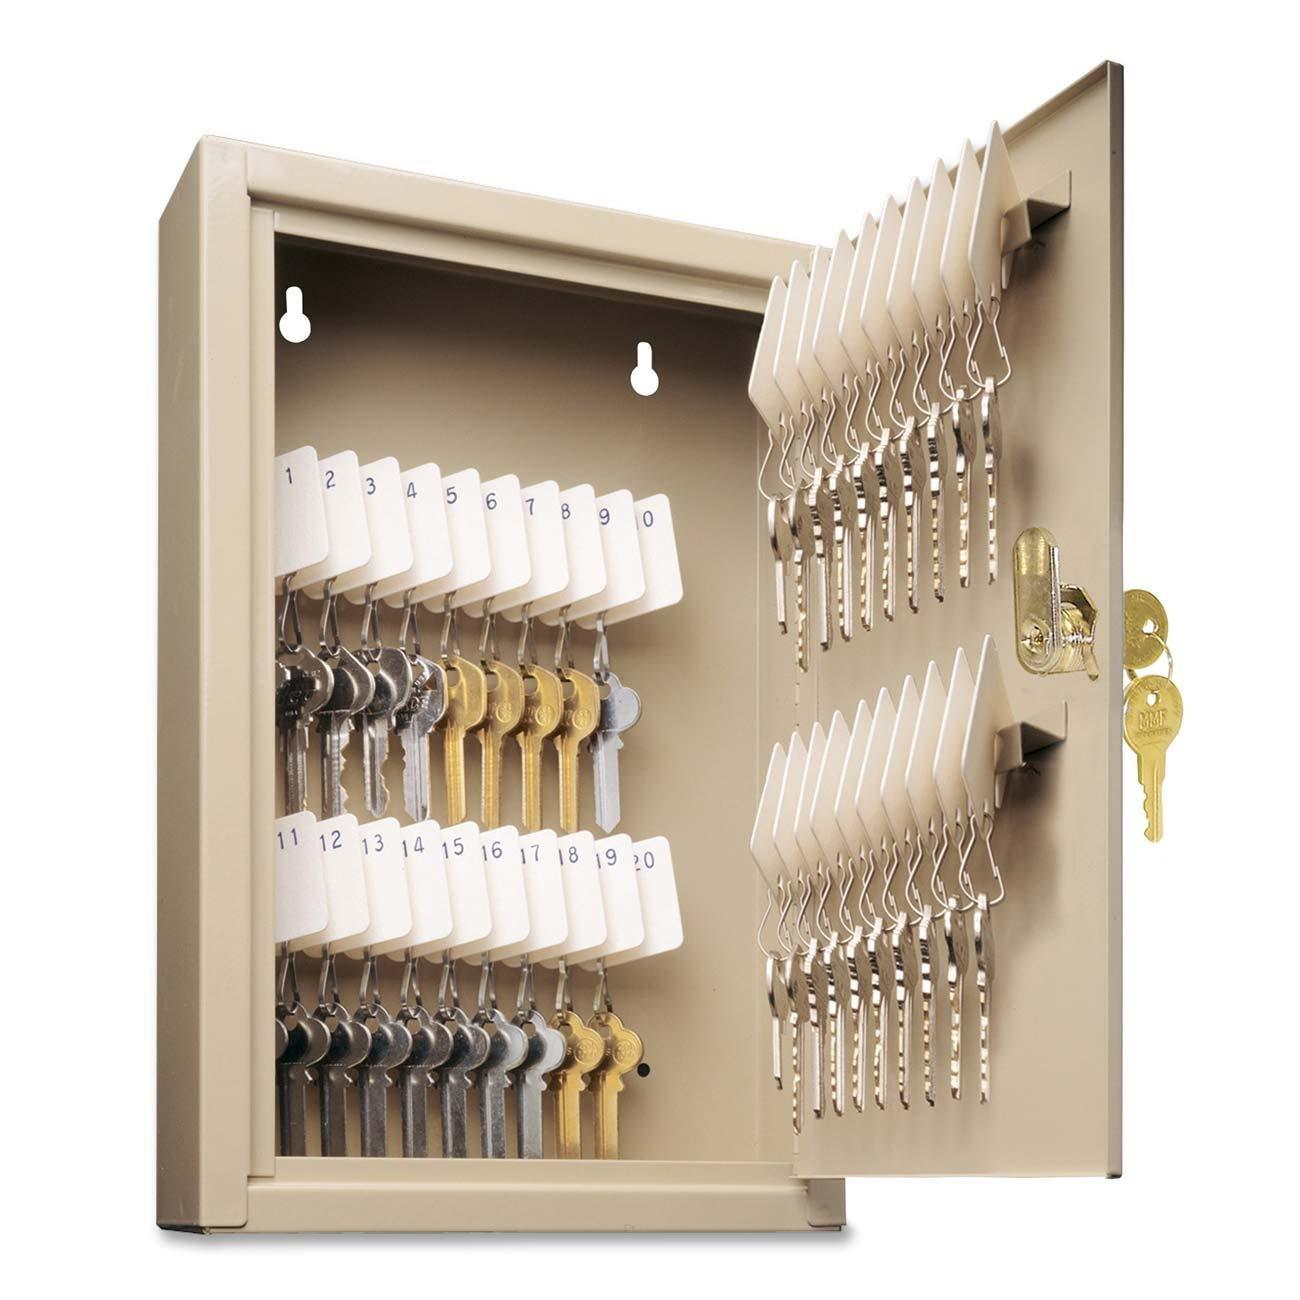 STEELMASTER Unitag Locking Cabinet, 8 x 12.13 x 2.63 Inches, 40-Key Capacity, Sand (201904003)